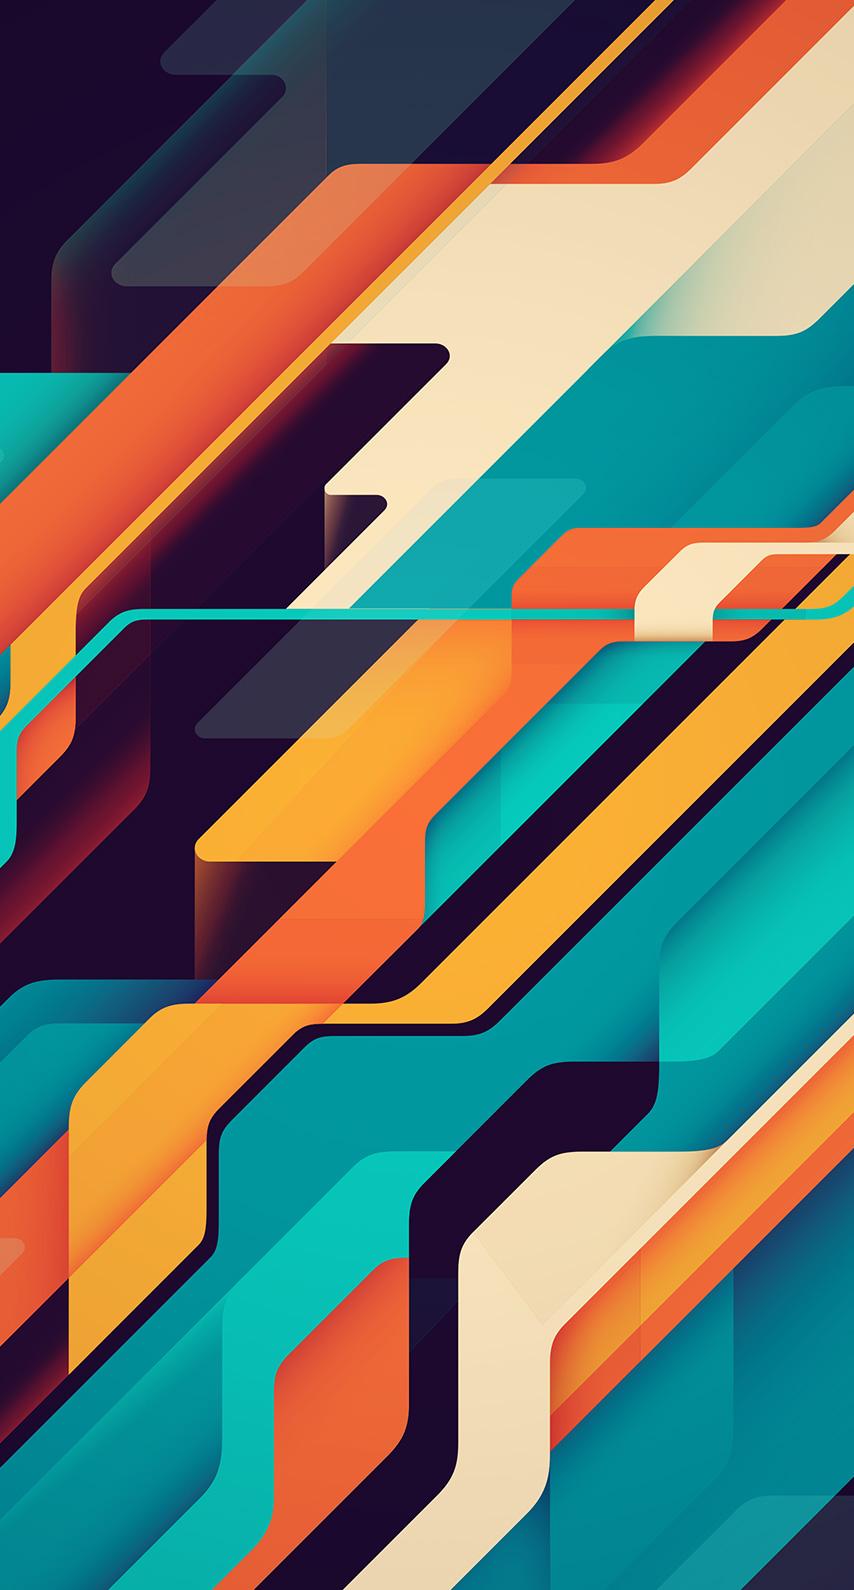 pattern, smoke, bright, vintage, art, graphic, paper, design